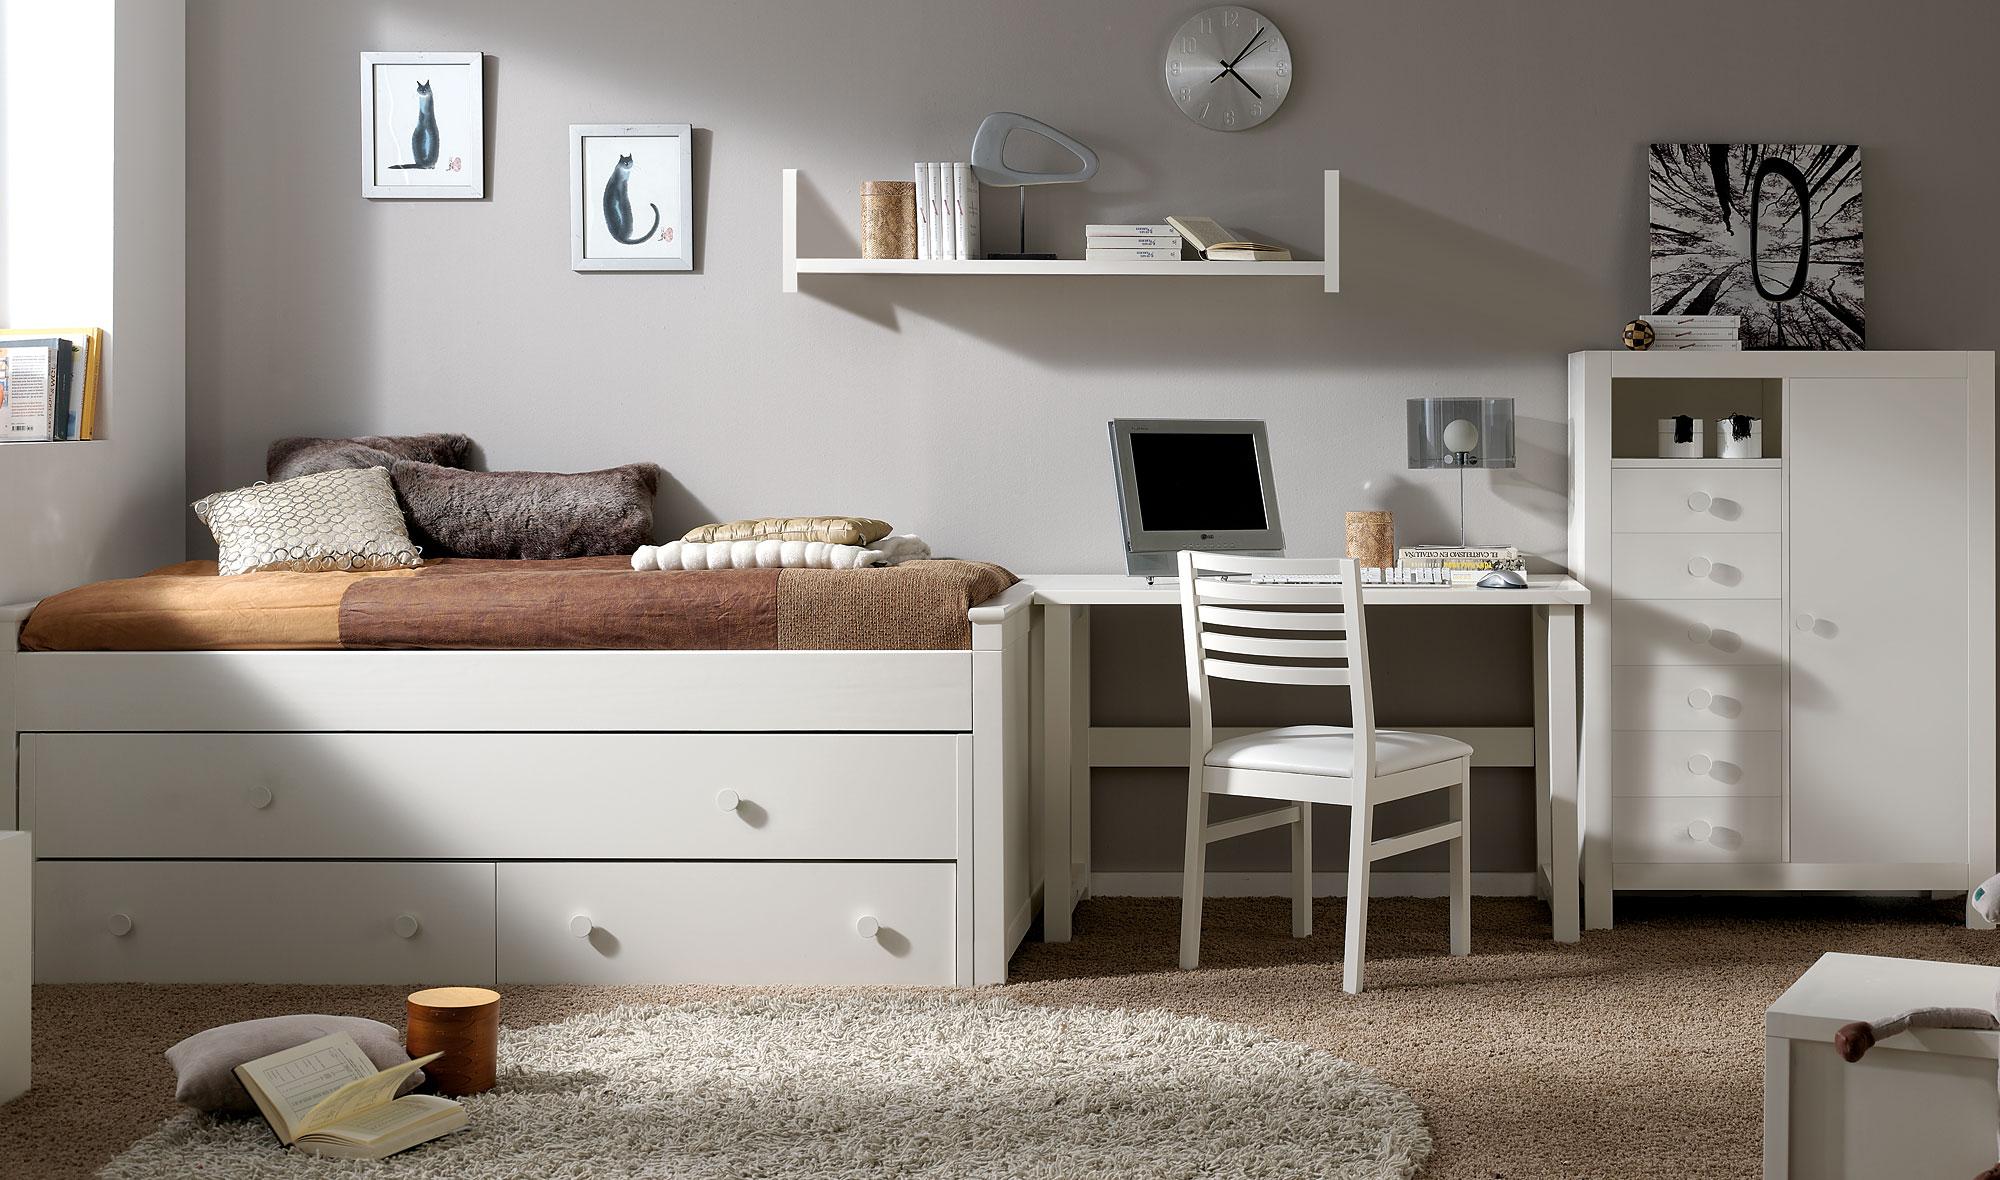 Dormitorio infantil kika iv en tu - Muebles dormitorio infantil ...